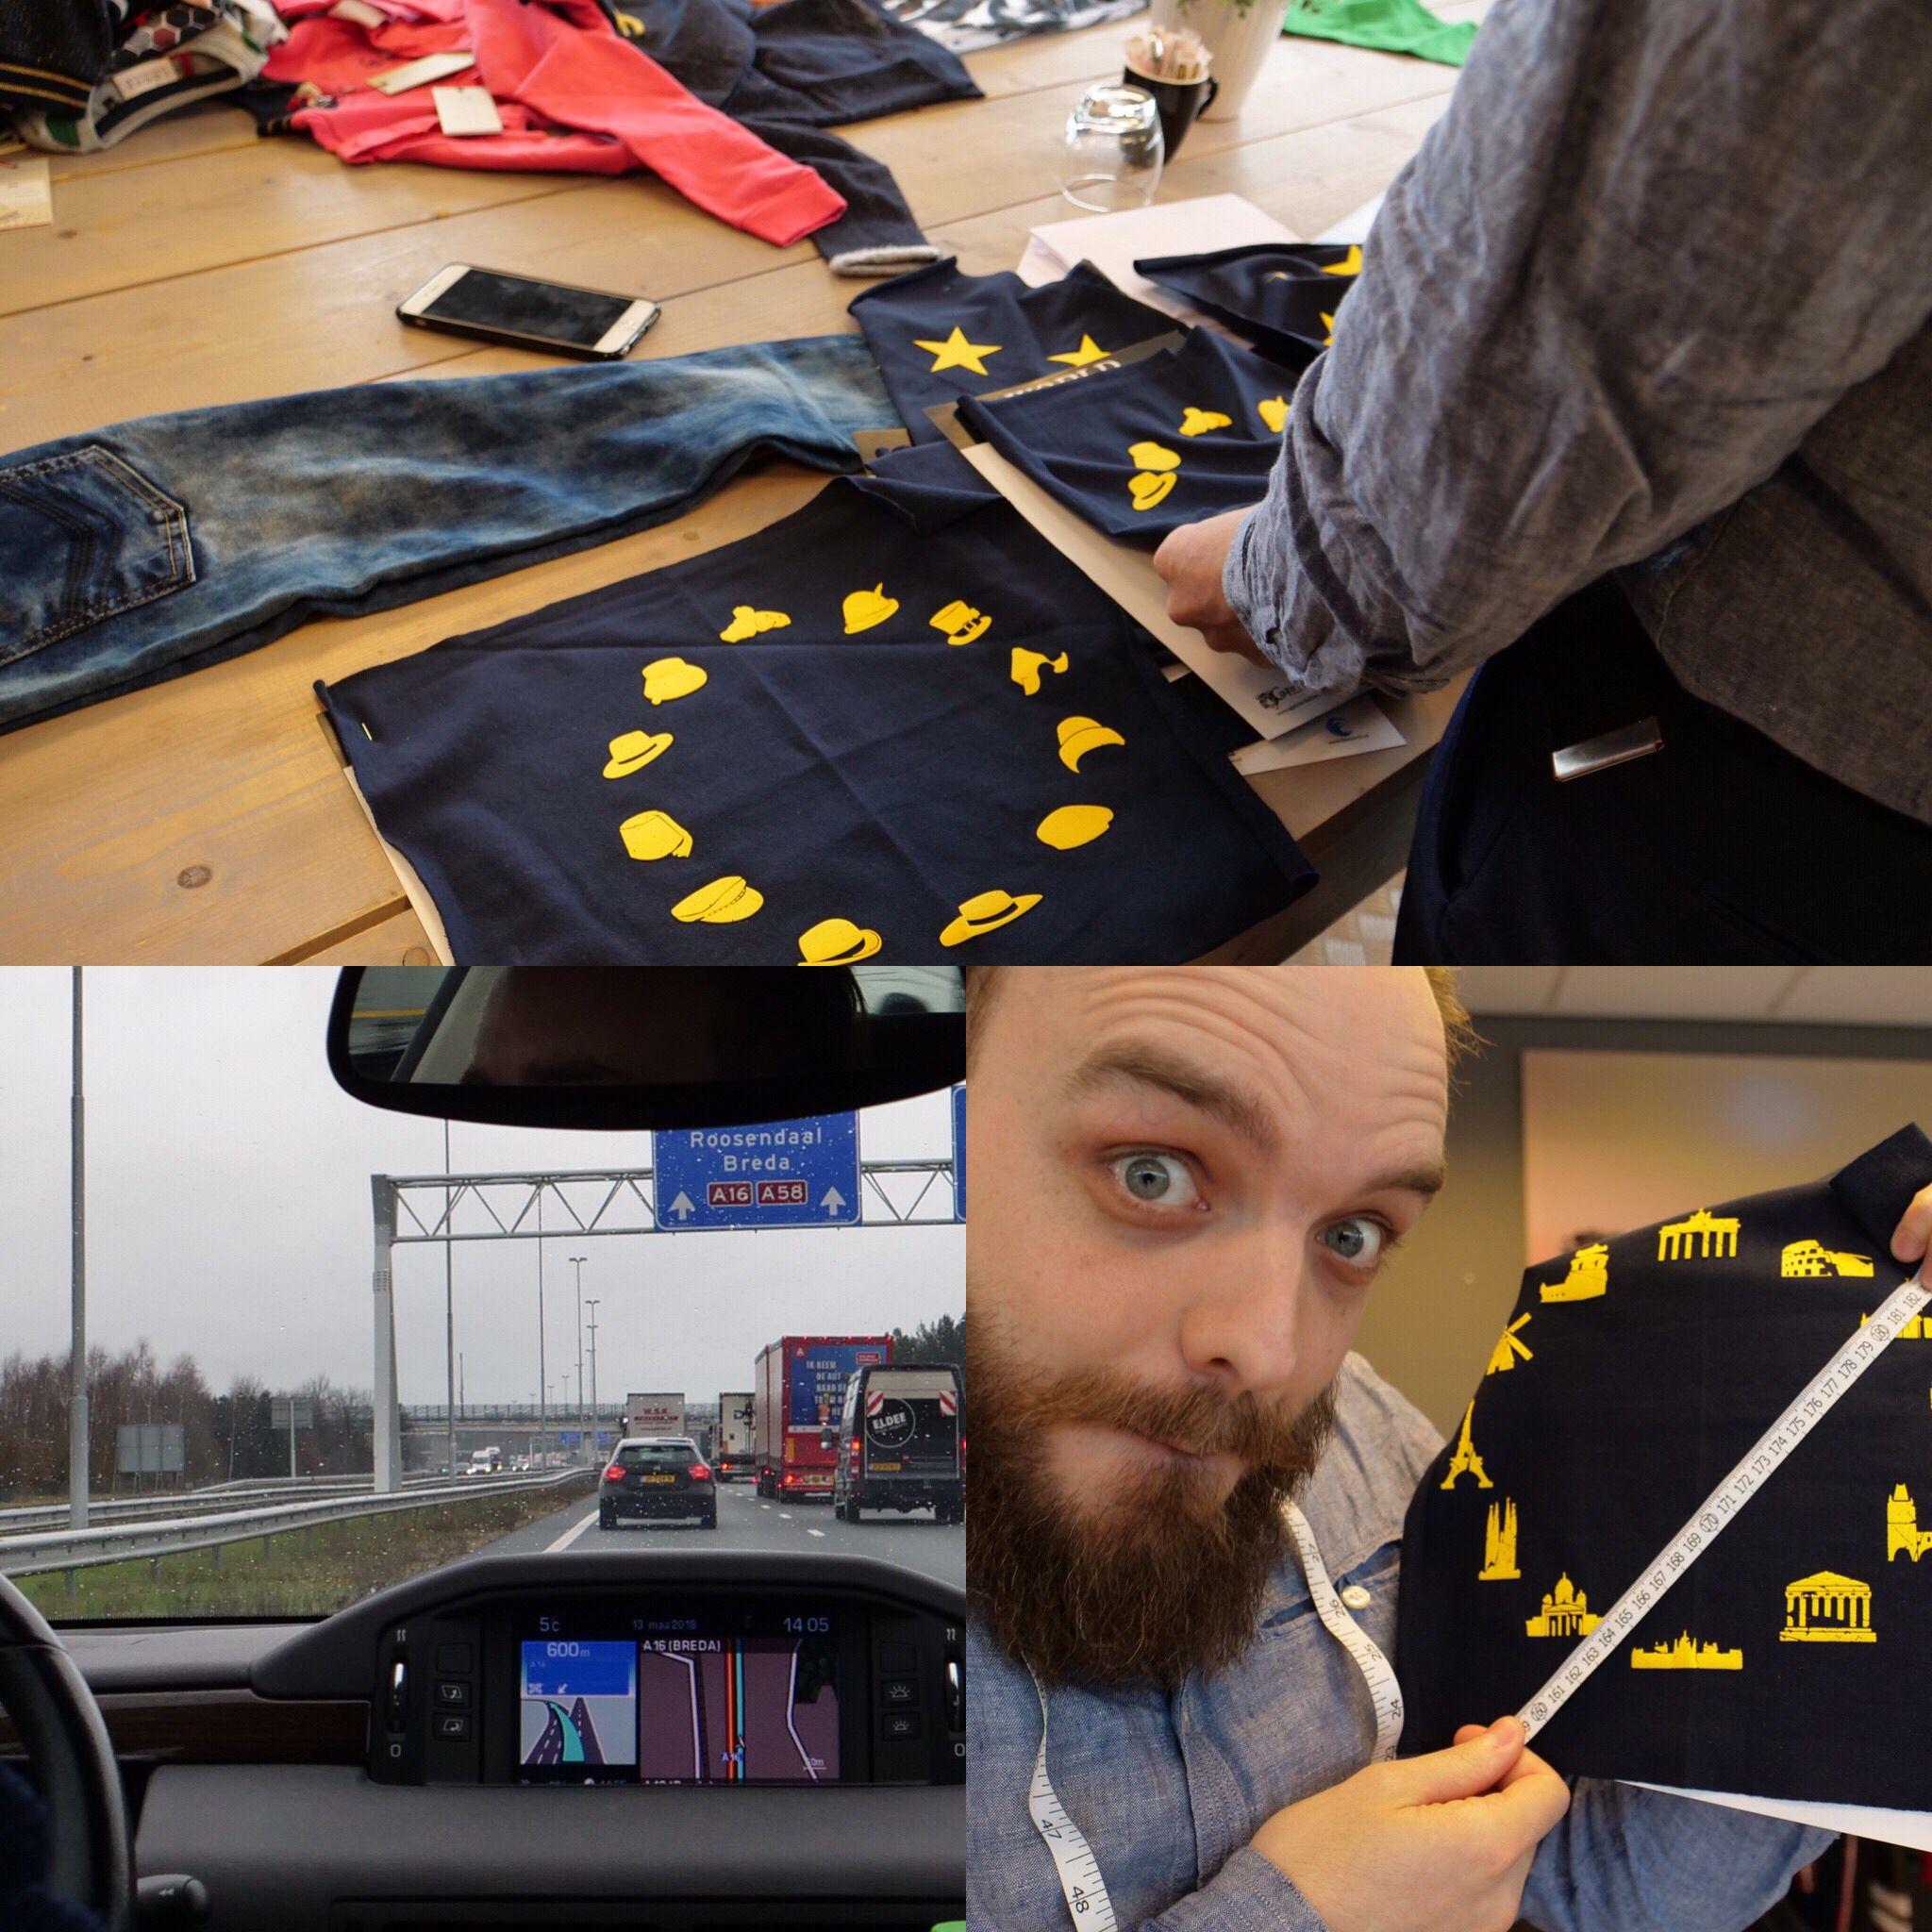 Pin Van European By Choice Op Production Updates